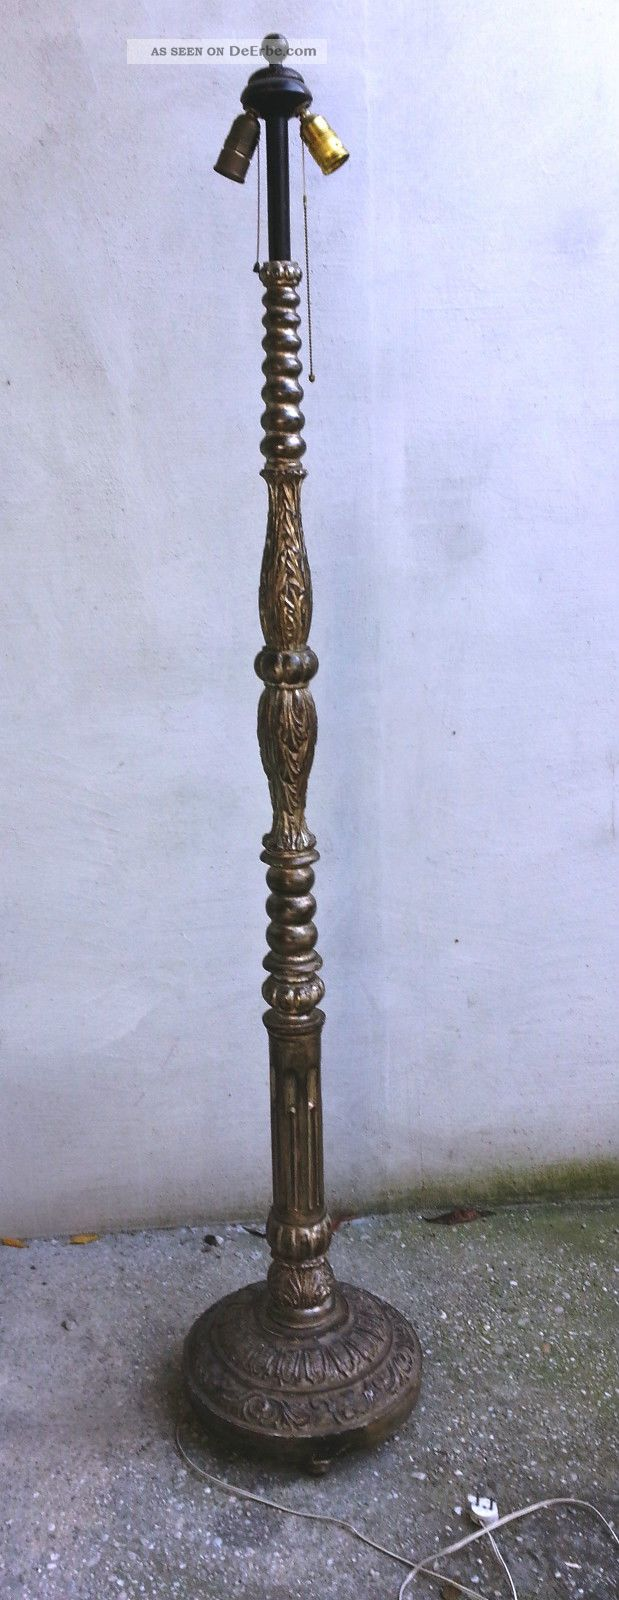 Stehlampe Antik Holz Caseconrad Com